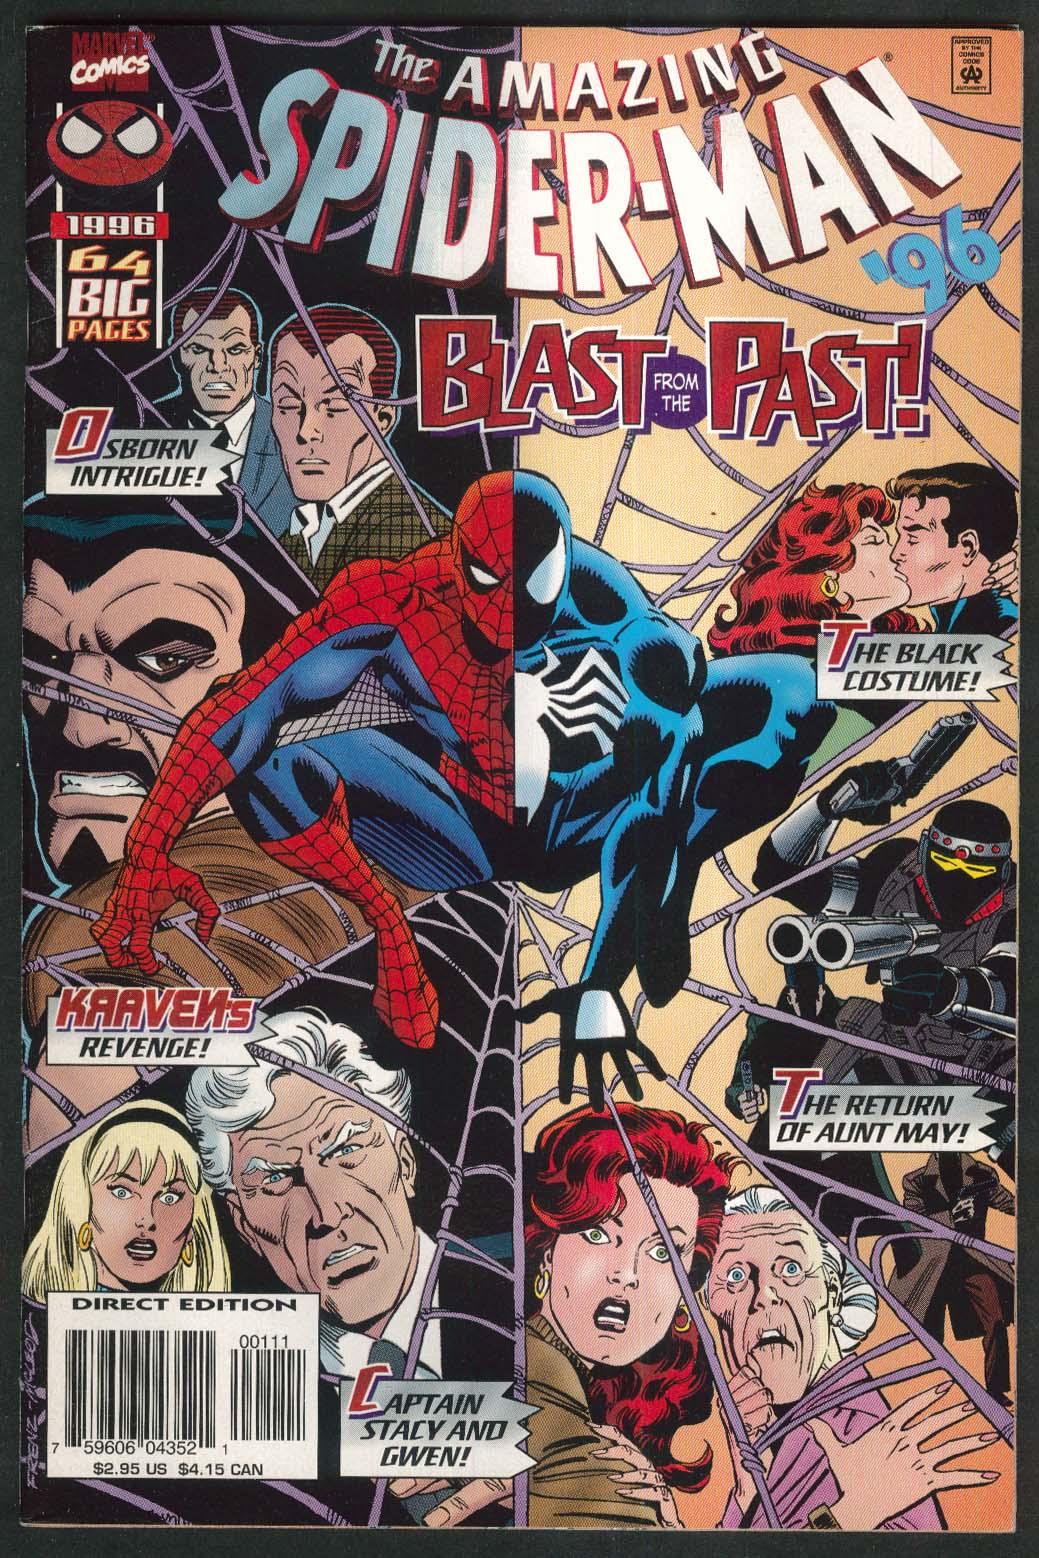 AMAZING SPIDER-MAN 1996 Annual Marvel comic book